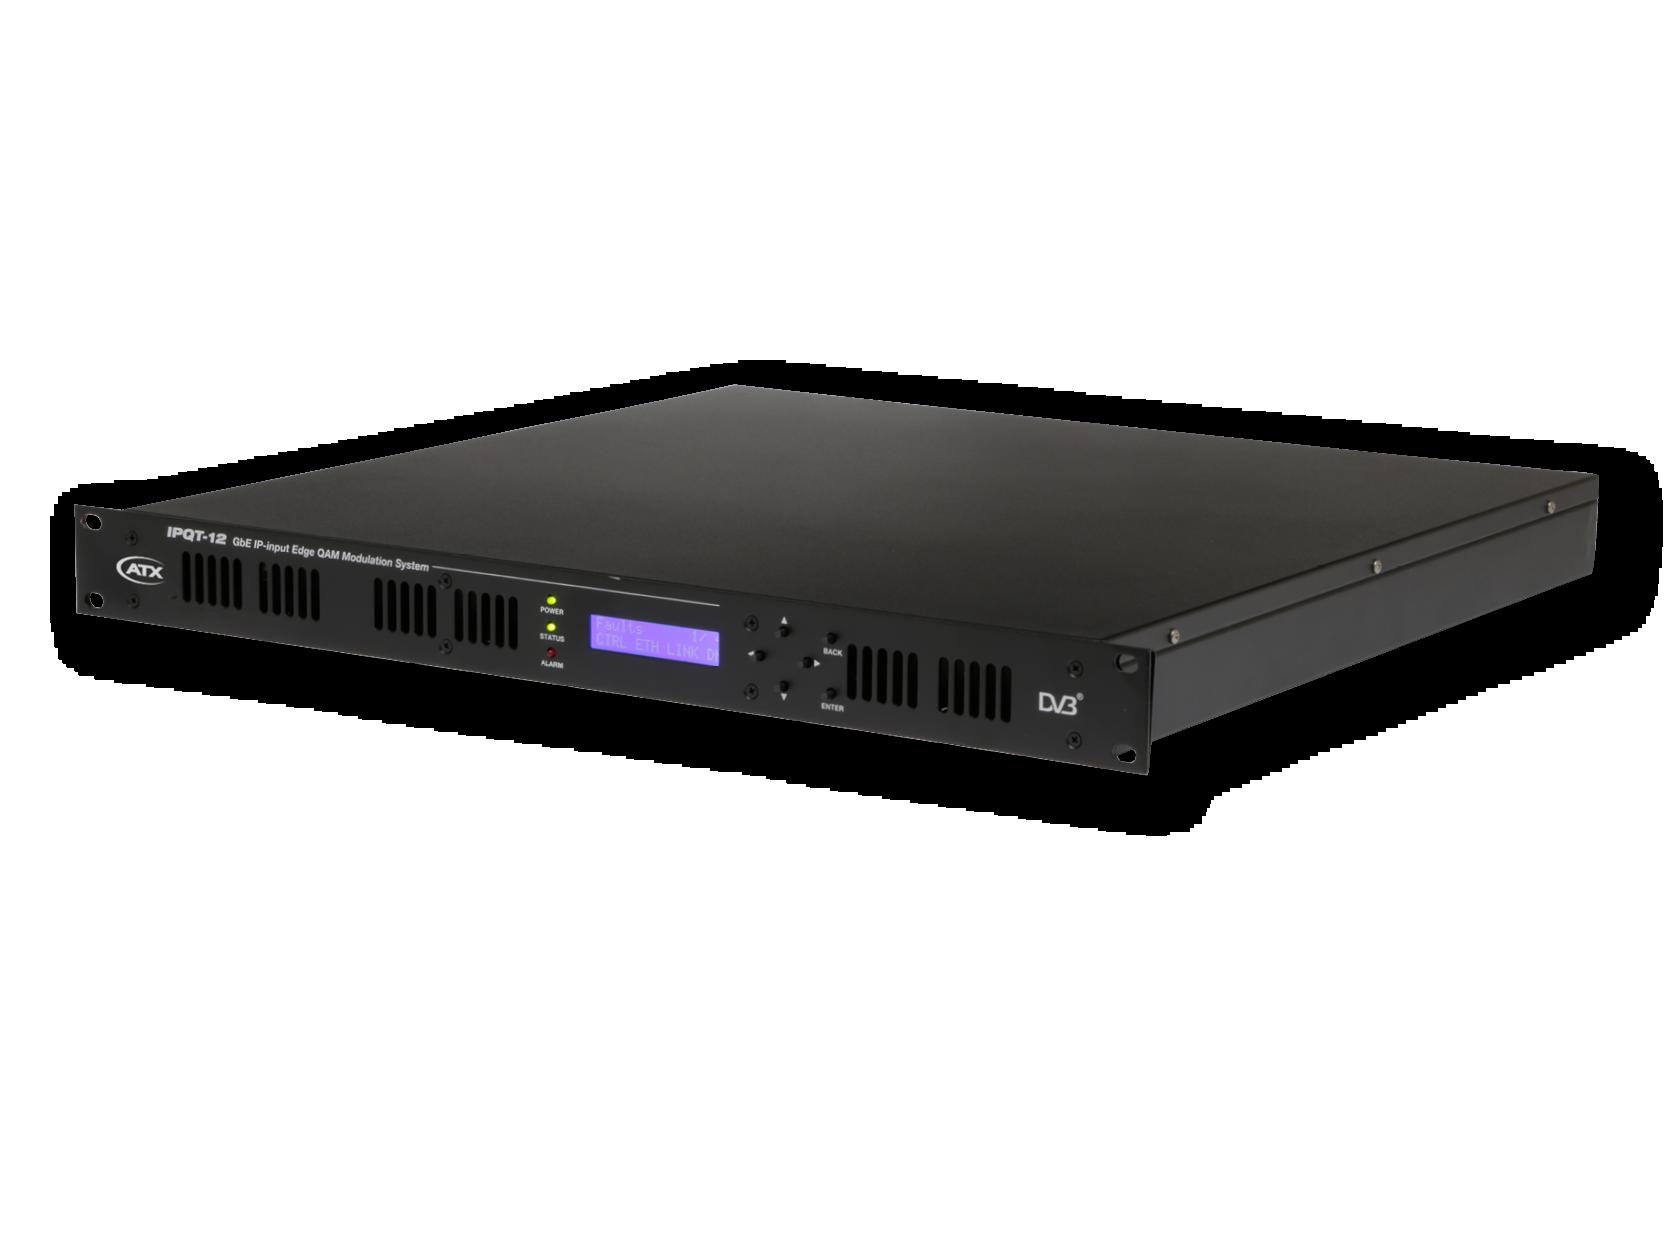 Ipqt 12 Gbe Ip Input Edgeqam Modulation System Atx Networks Power Inserters Couplers Rlh Industries